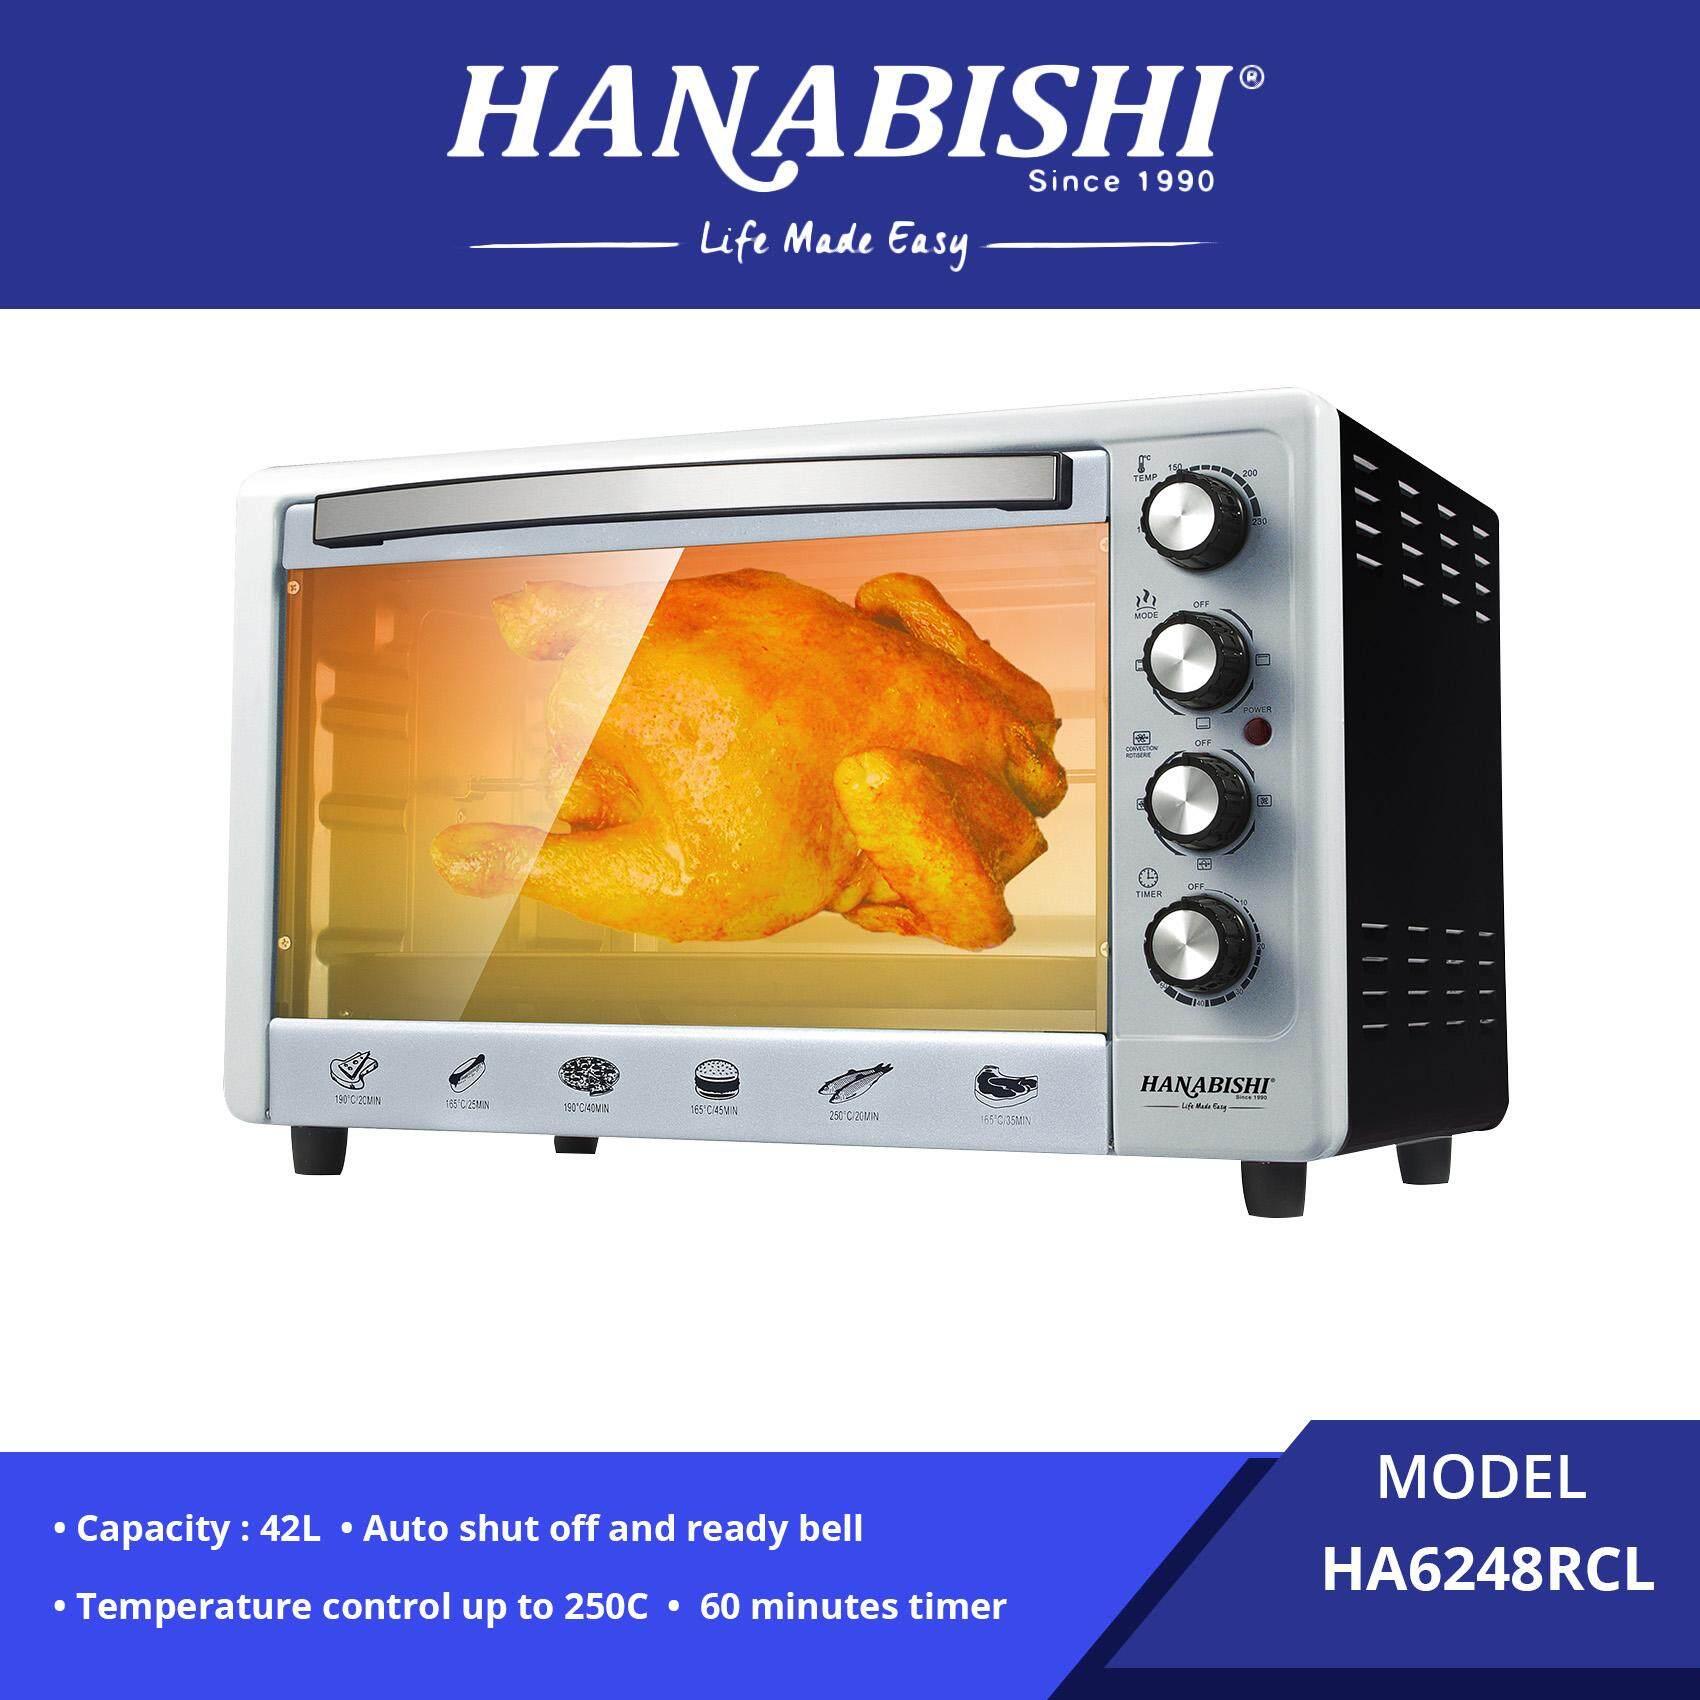 Hanabishi Electric Oven 48L (Rotisserie & Convection) HA6248RCL